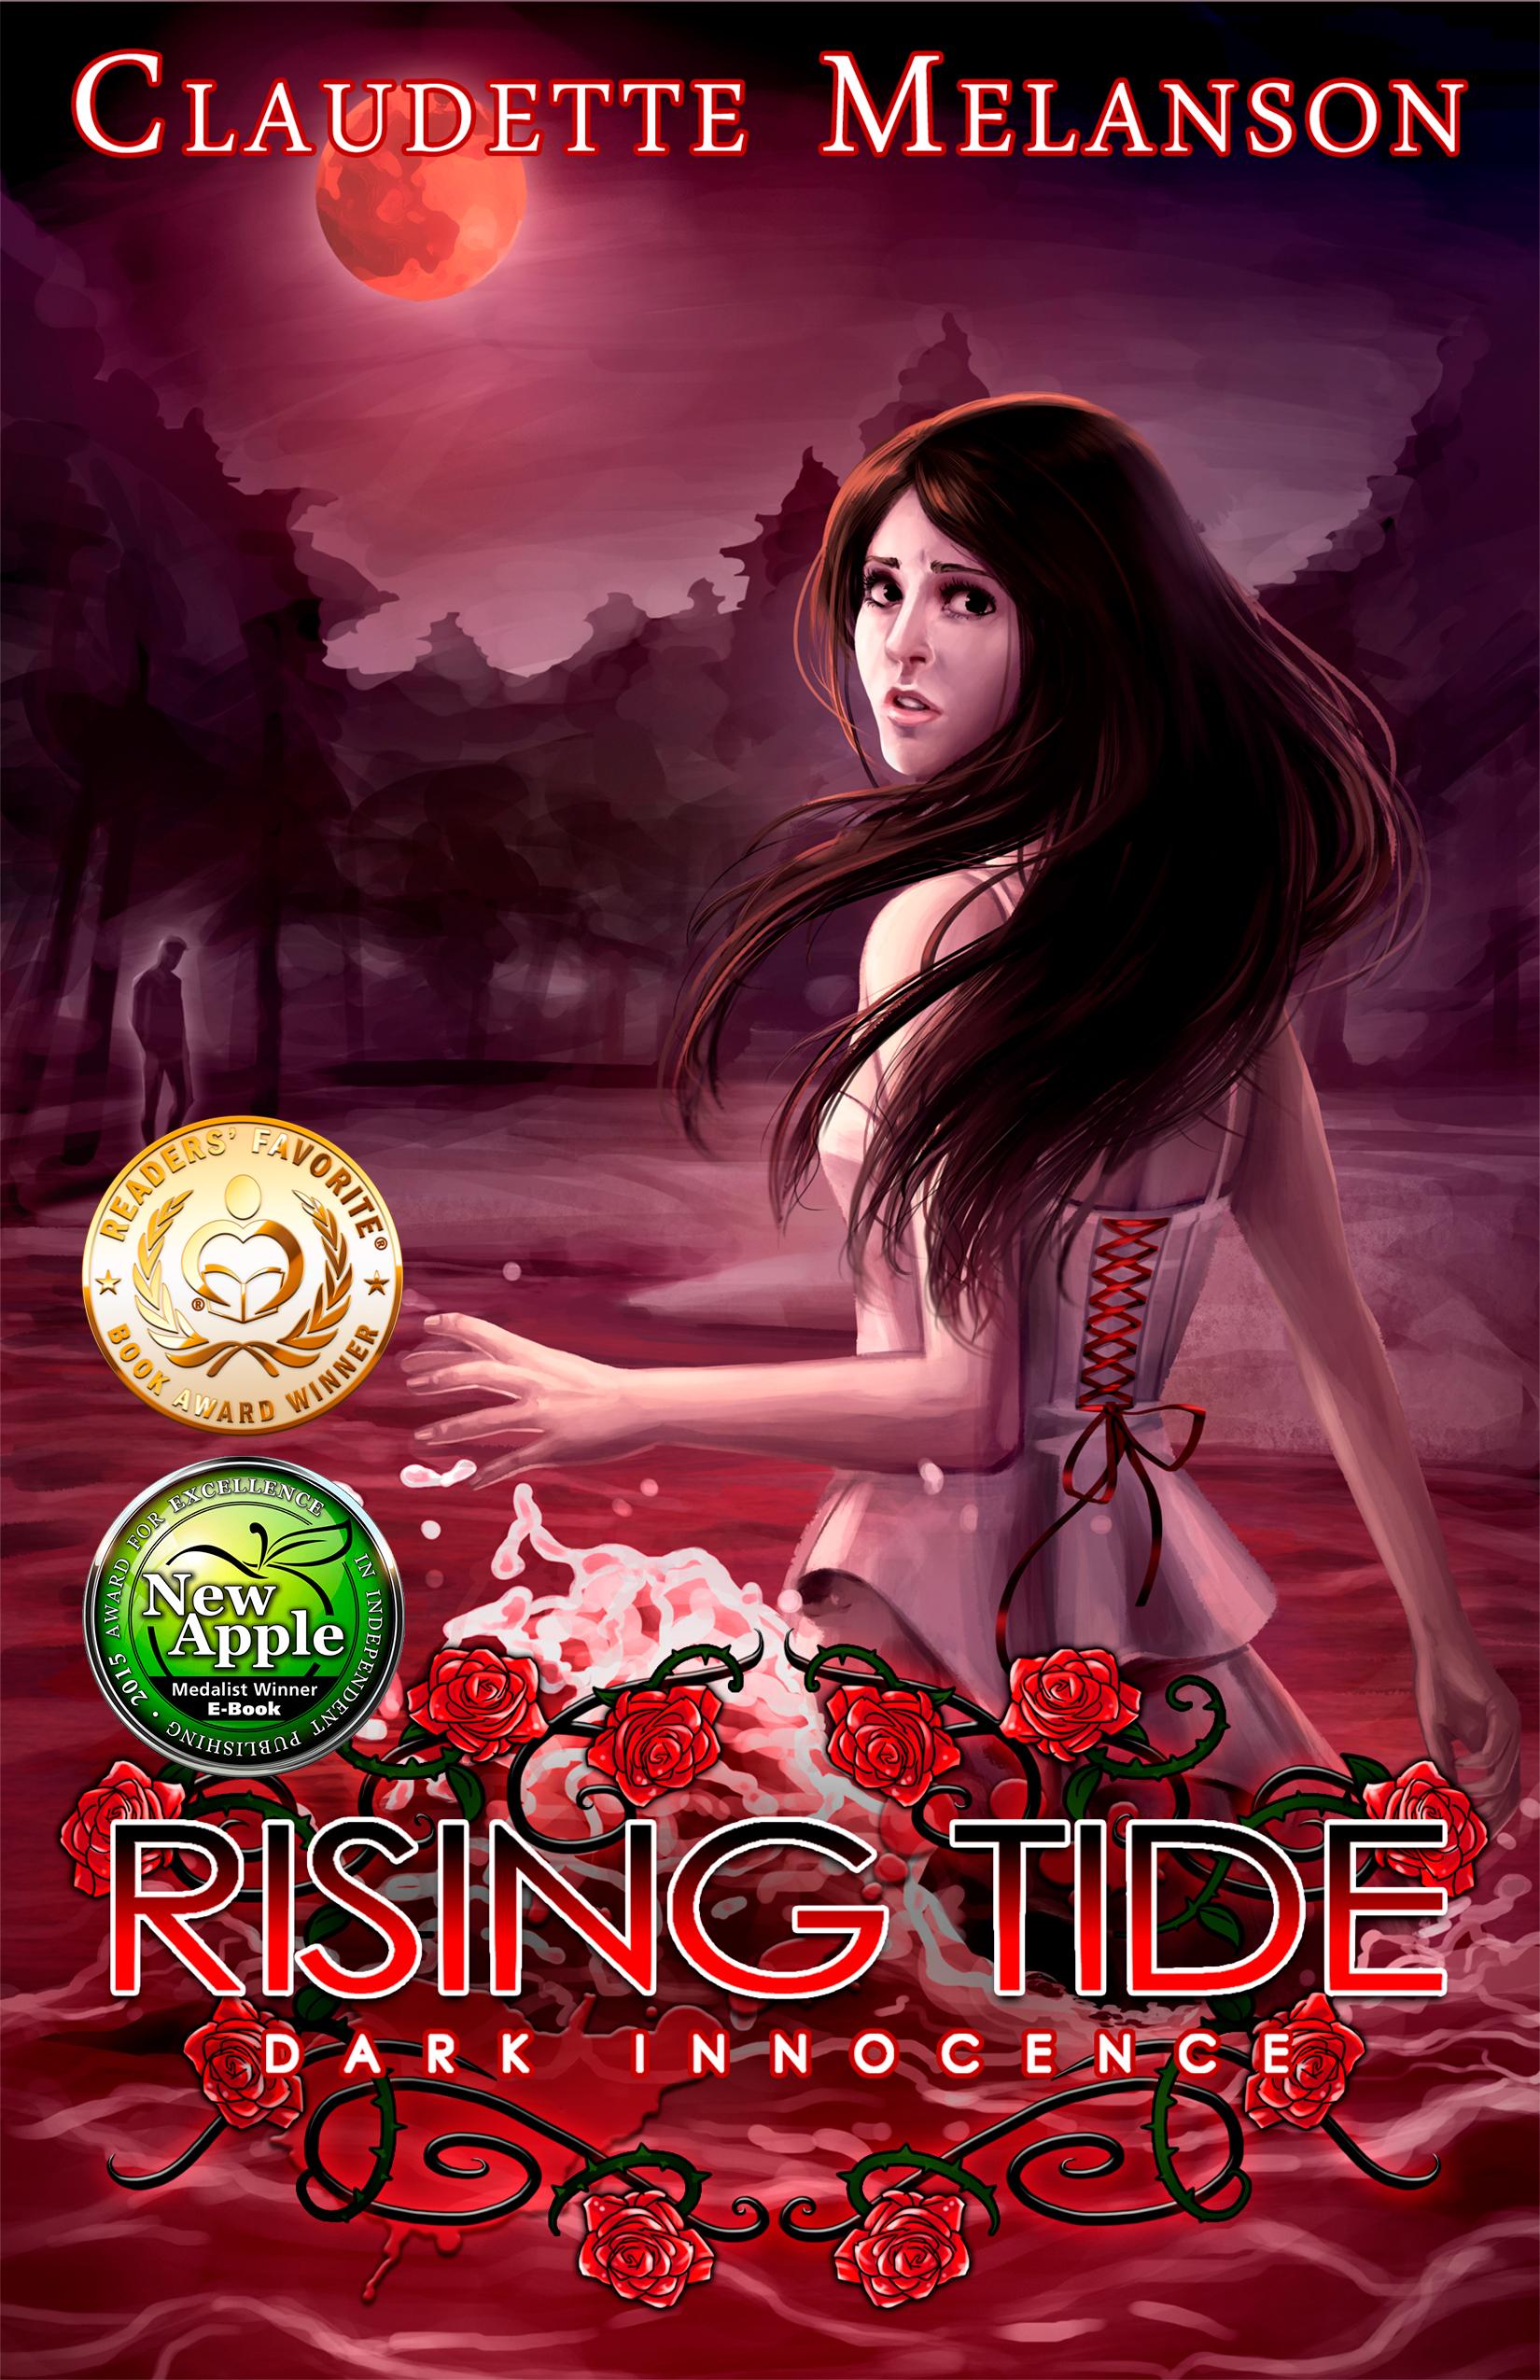 Rising Tide: Dark Innocence, an Ebook by Claudette Melanson